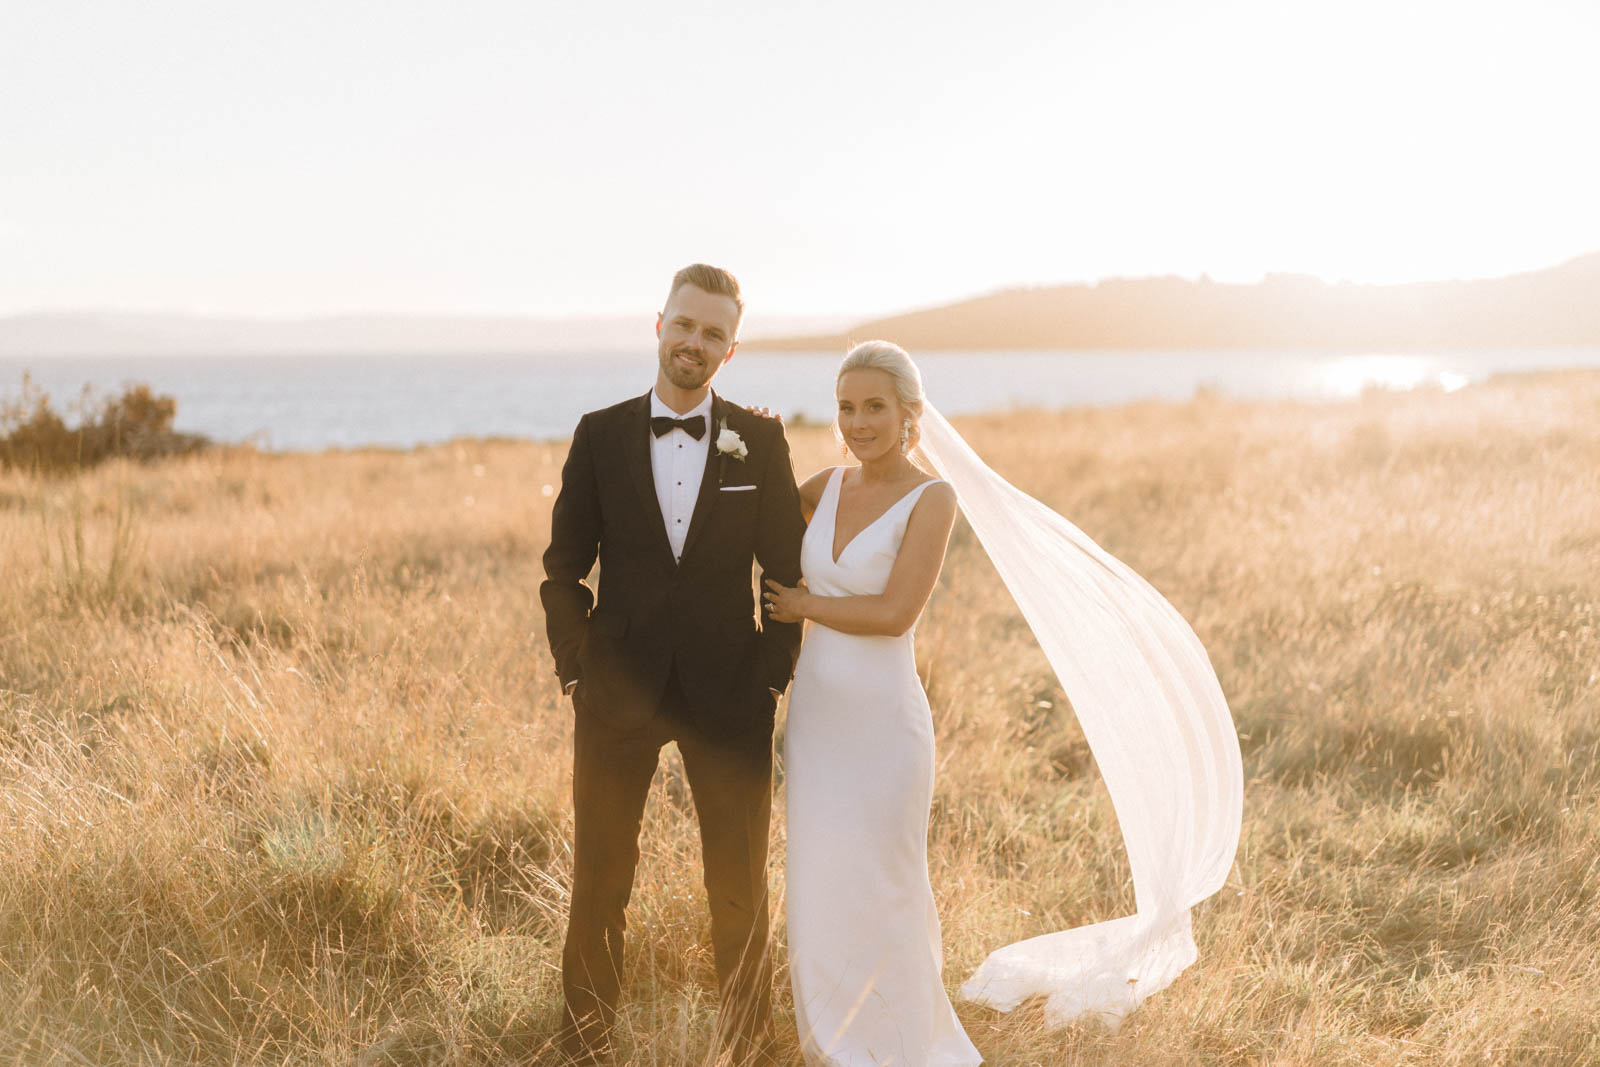 newfound-k-s-hilton-taupo-wedding-photographer-077